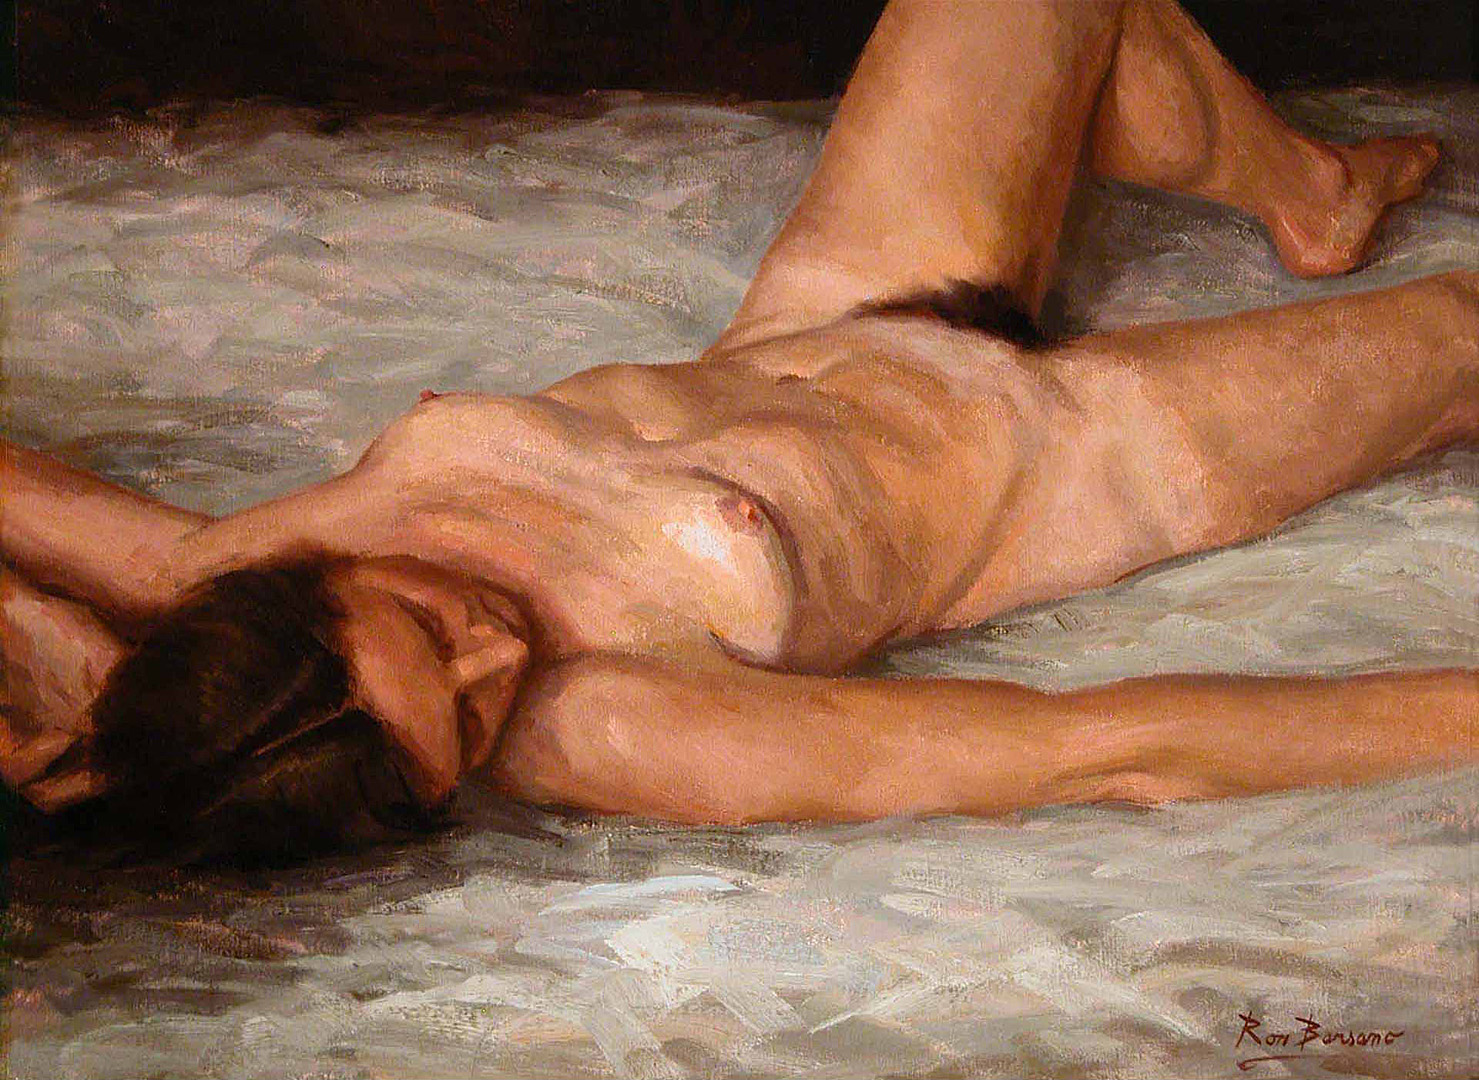 marcus-john-nude-hot-men-and-women-fuck